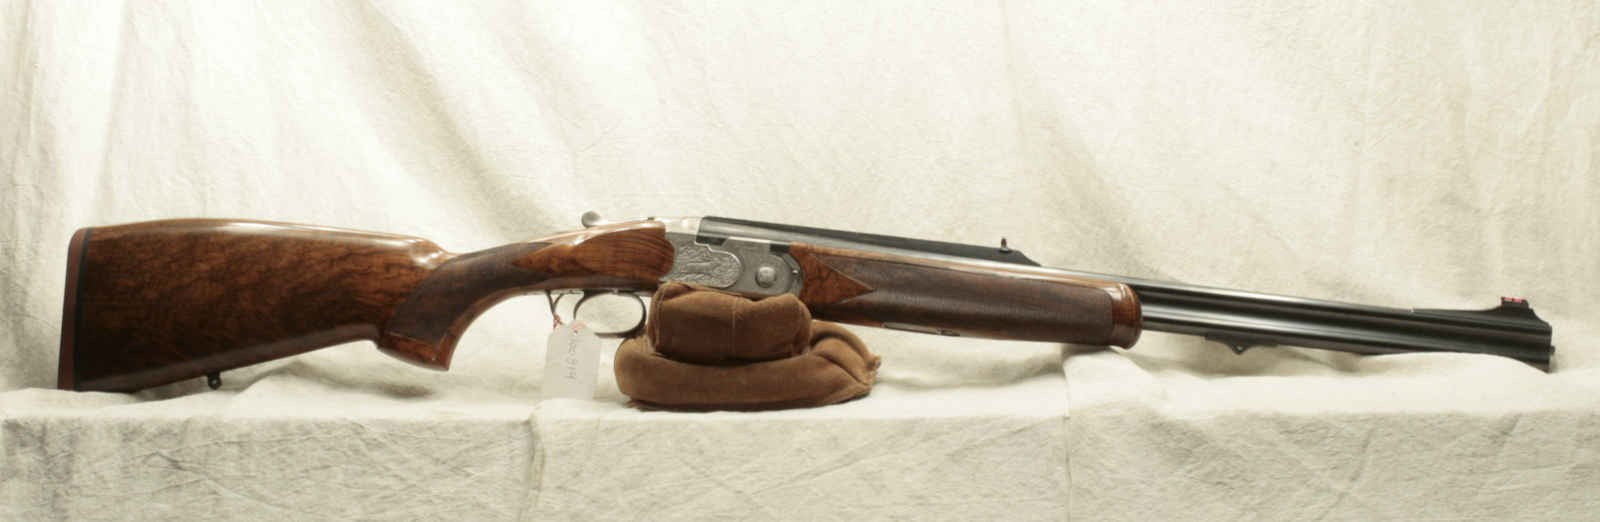 "Beretta ""Silver Sable"" Double Rifles-beretta-silver-sable-ii-armurerie-roussel.fr"